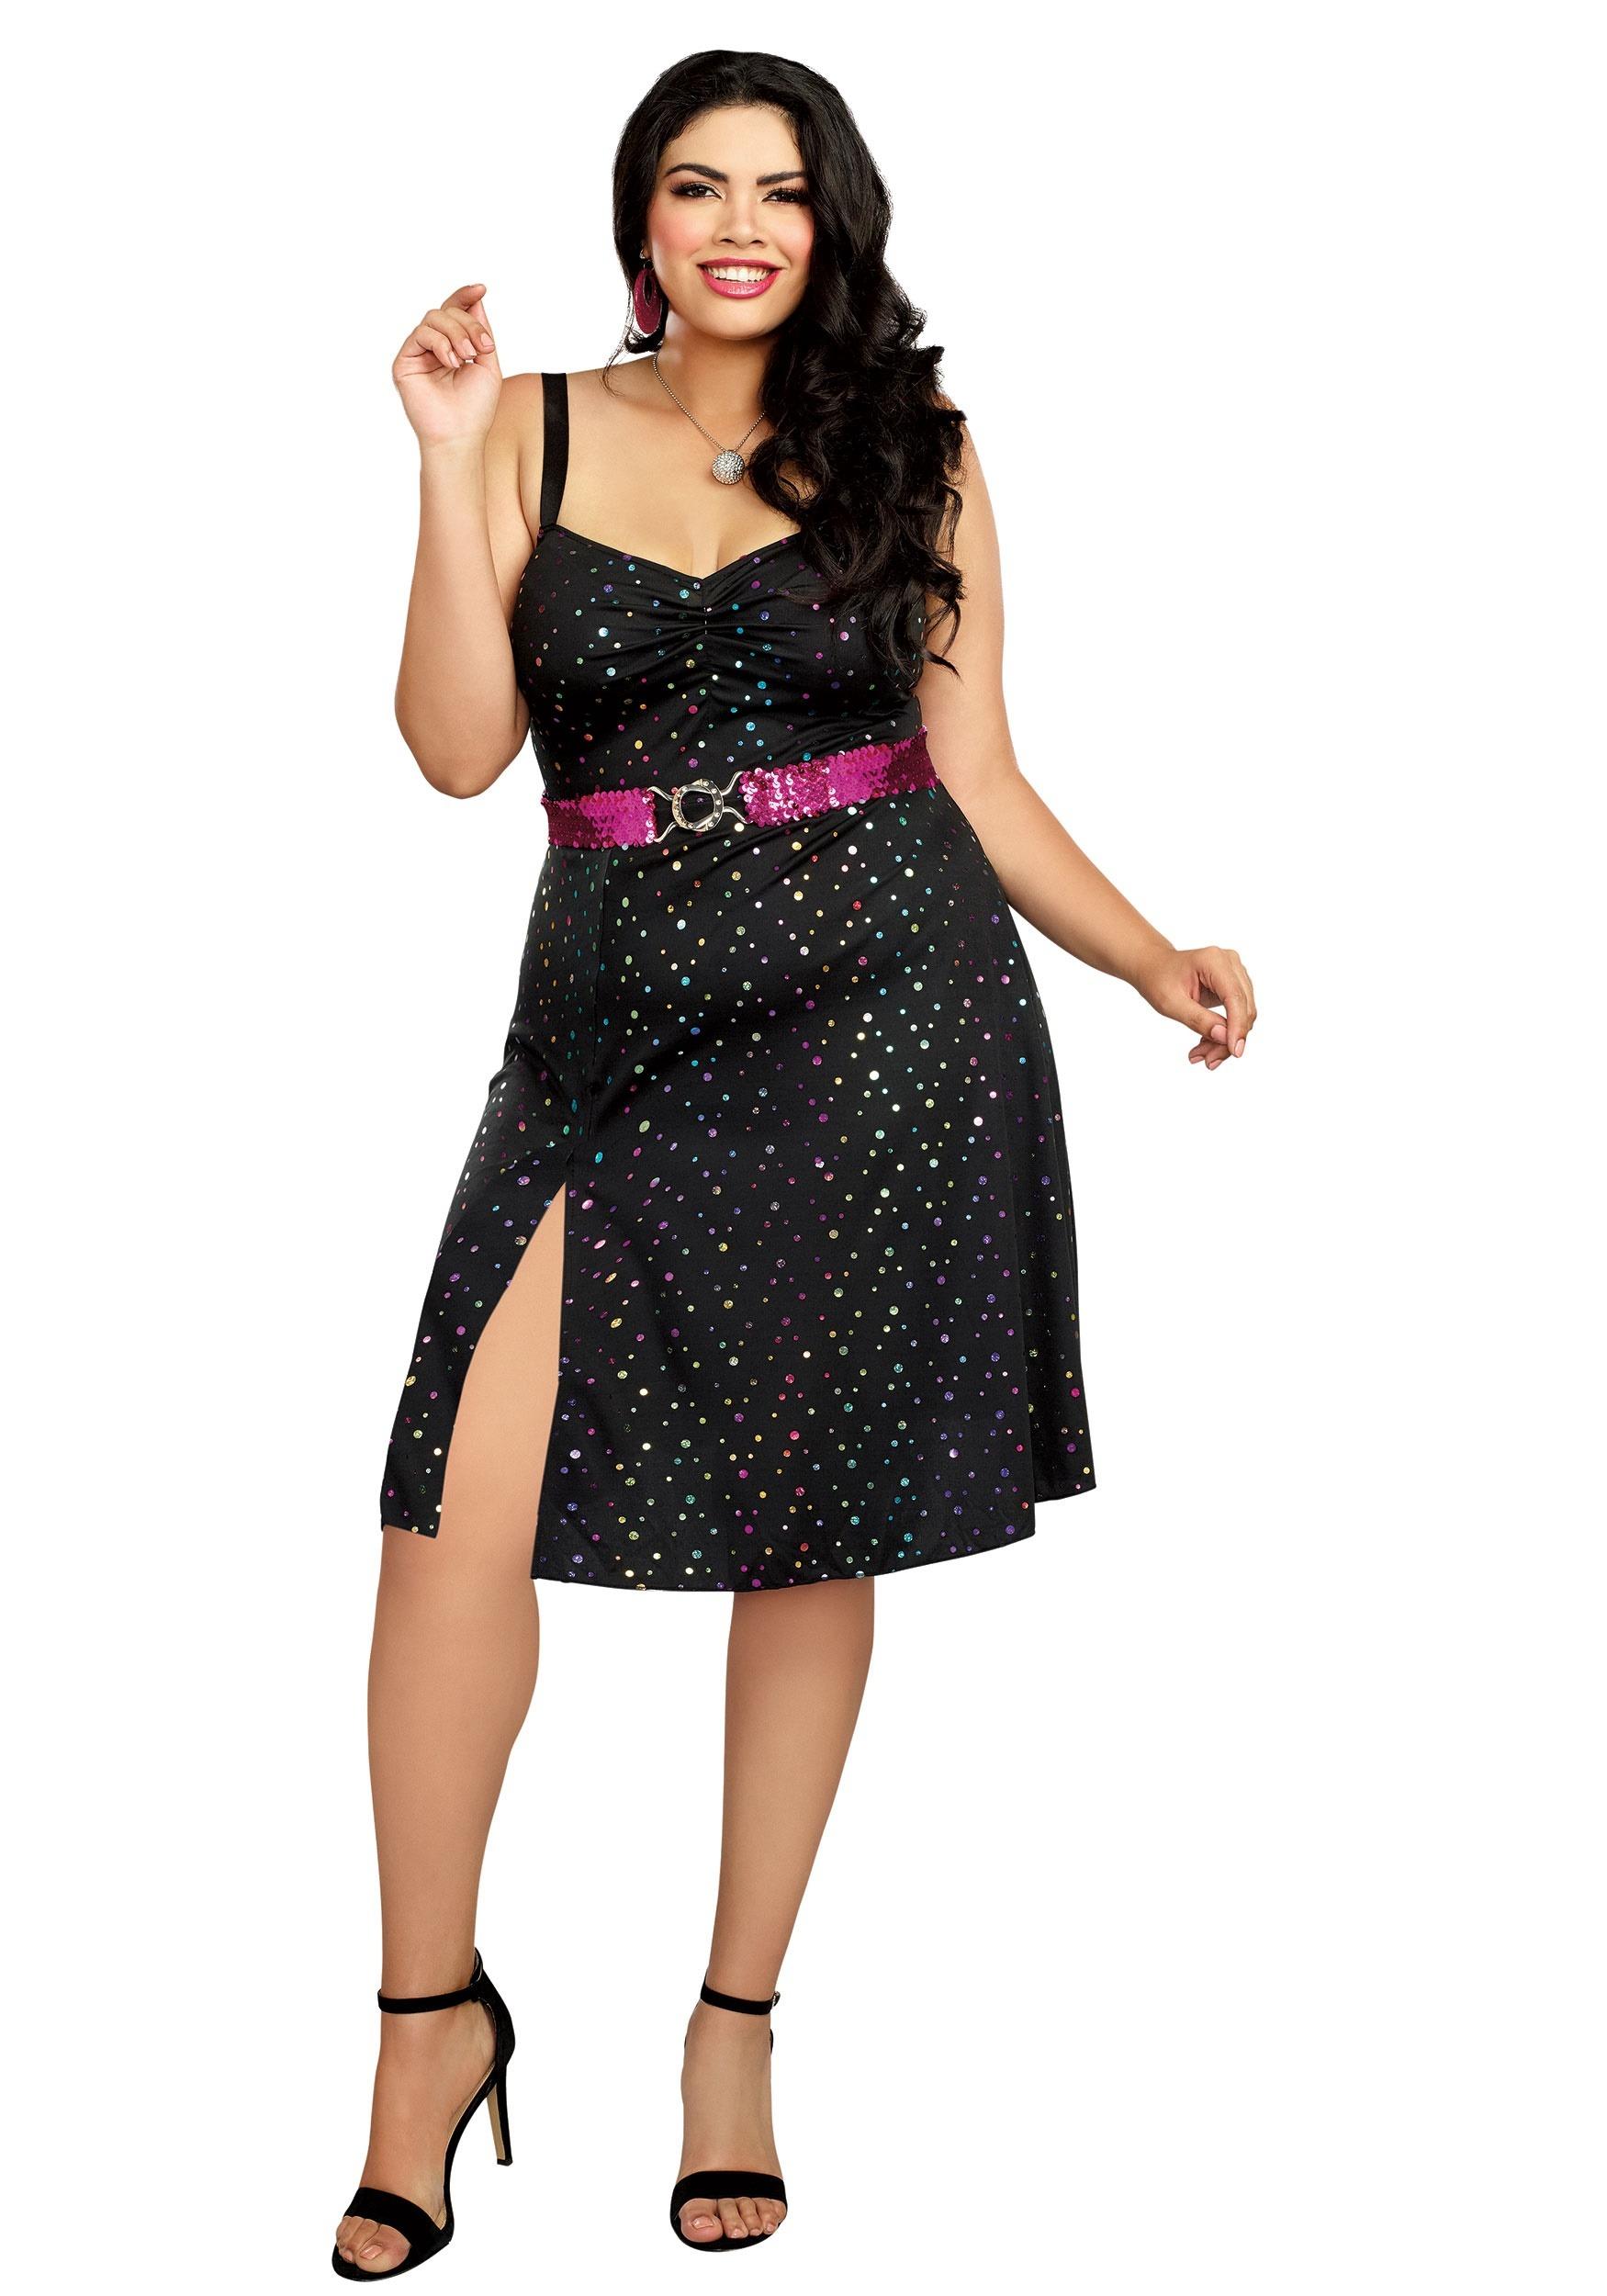 Disco Diva Plus Size Womenu0027s Costume  sc 1 st  Halloween Costumes & Disco Diva Plus Size Costume for Women